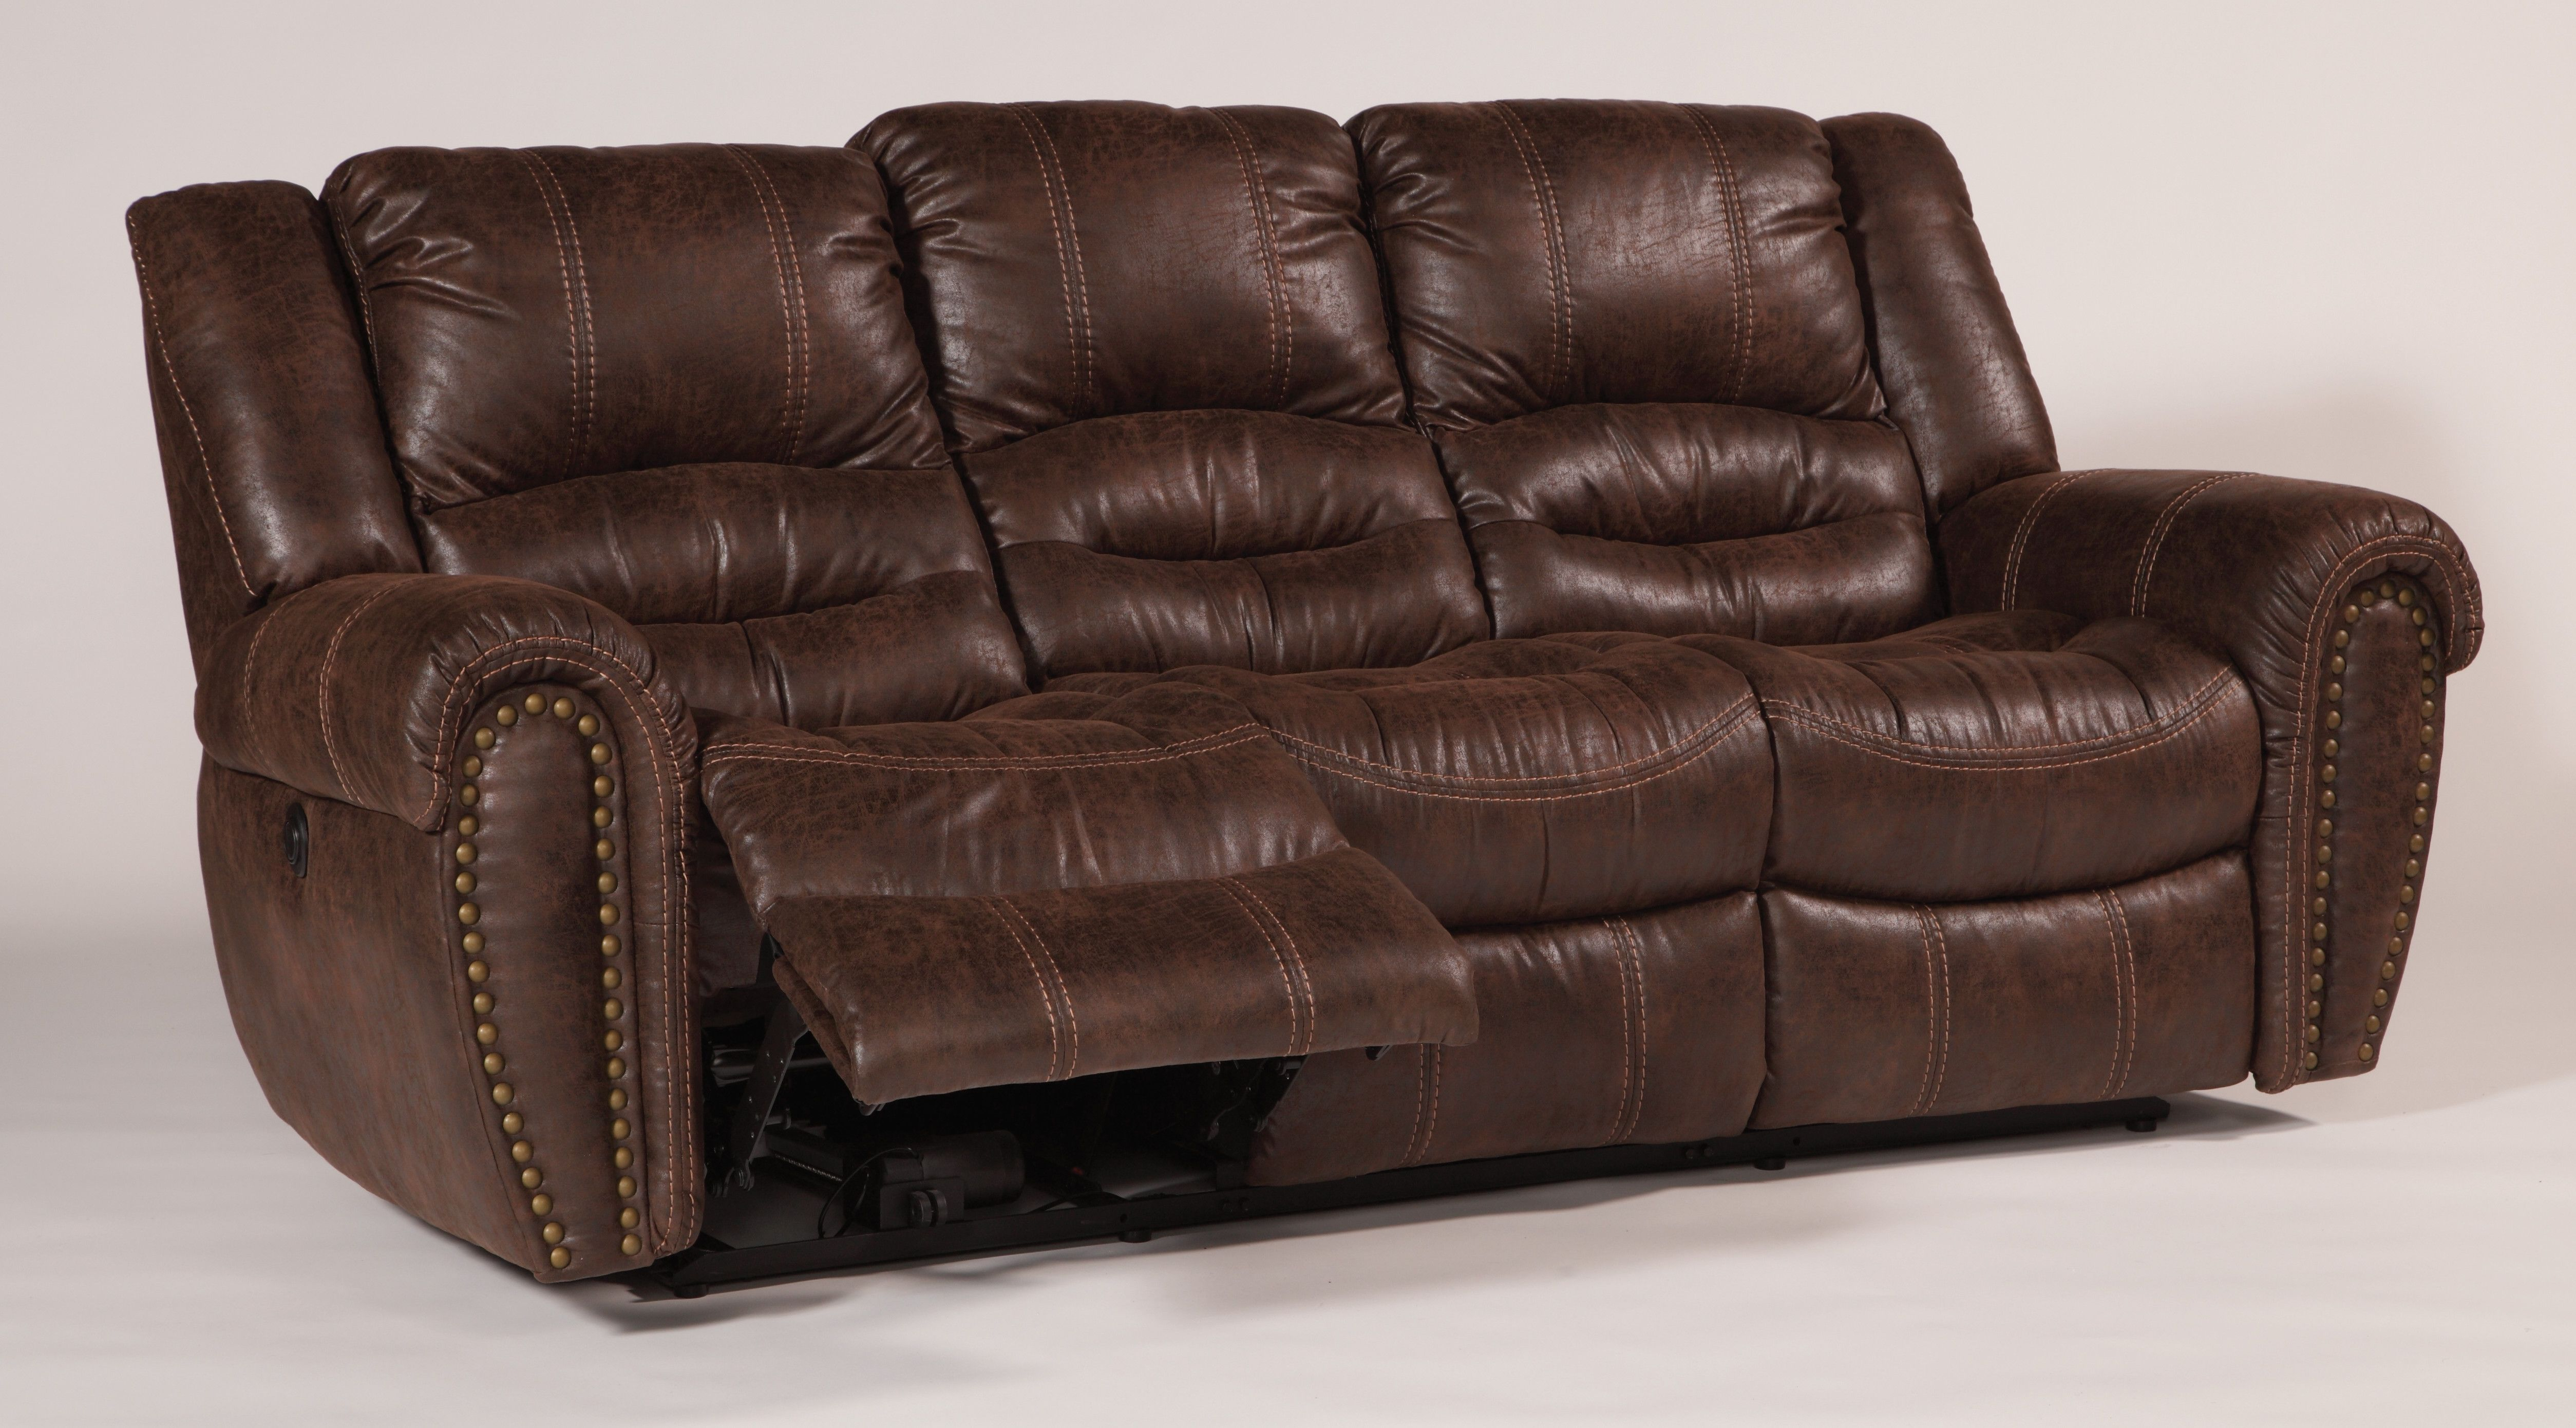 Downtown Latitudes Power Reclining Sofa 1710 62p Flexsteel Furniture Shopac Sofa Material Sofa Design Sofa